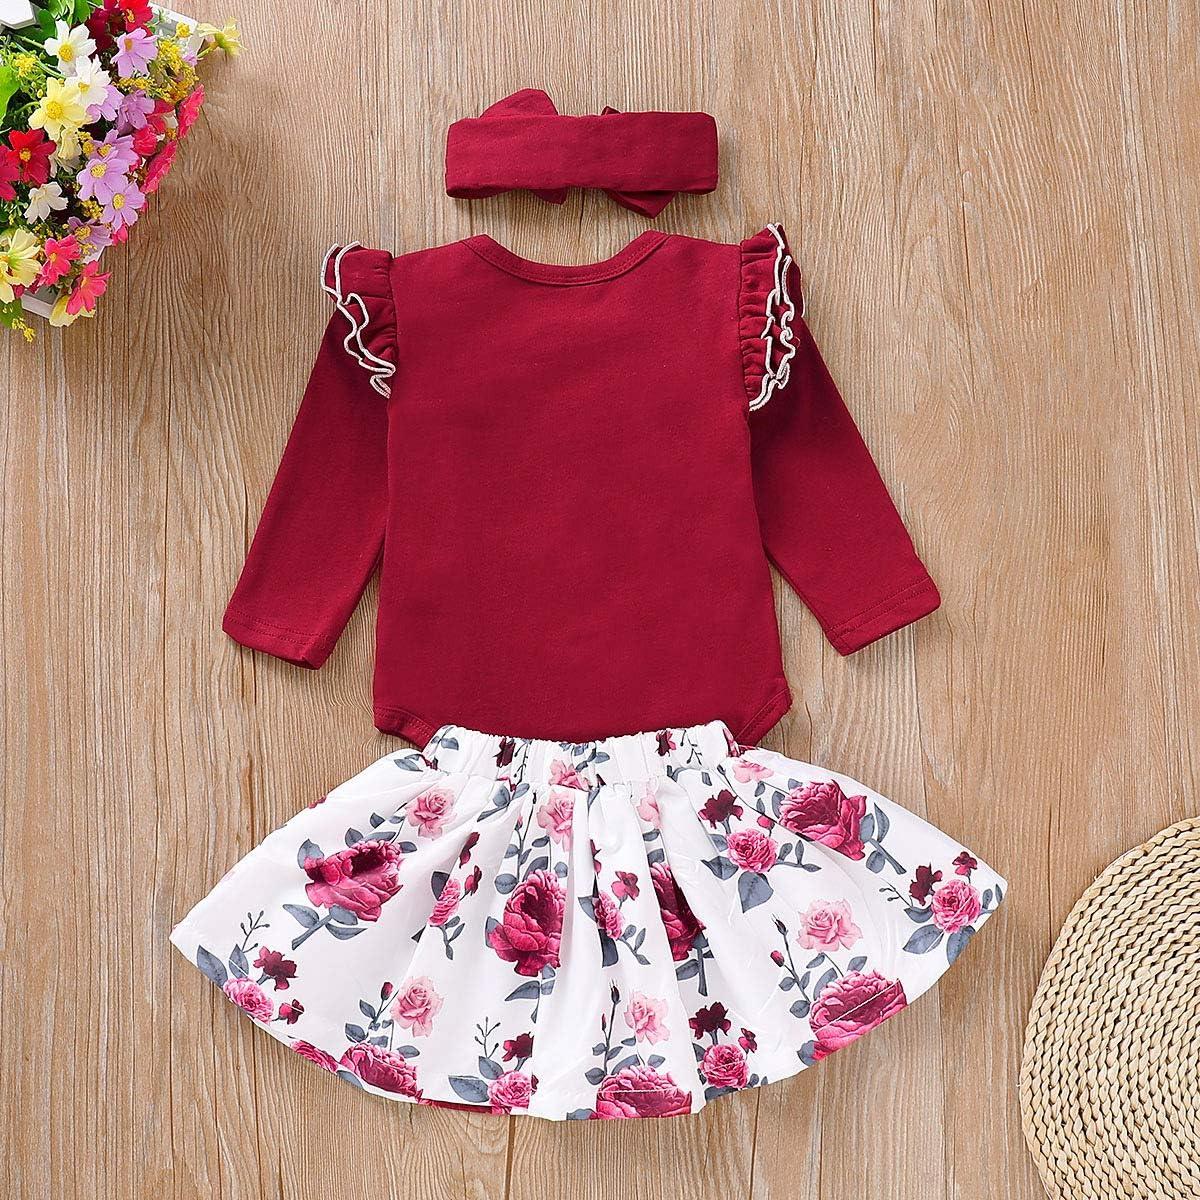 Newborn Baby Girls Ruffle Romper Floral Skirt Dress Headband Outfits Clothes Set